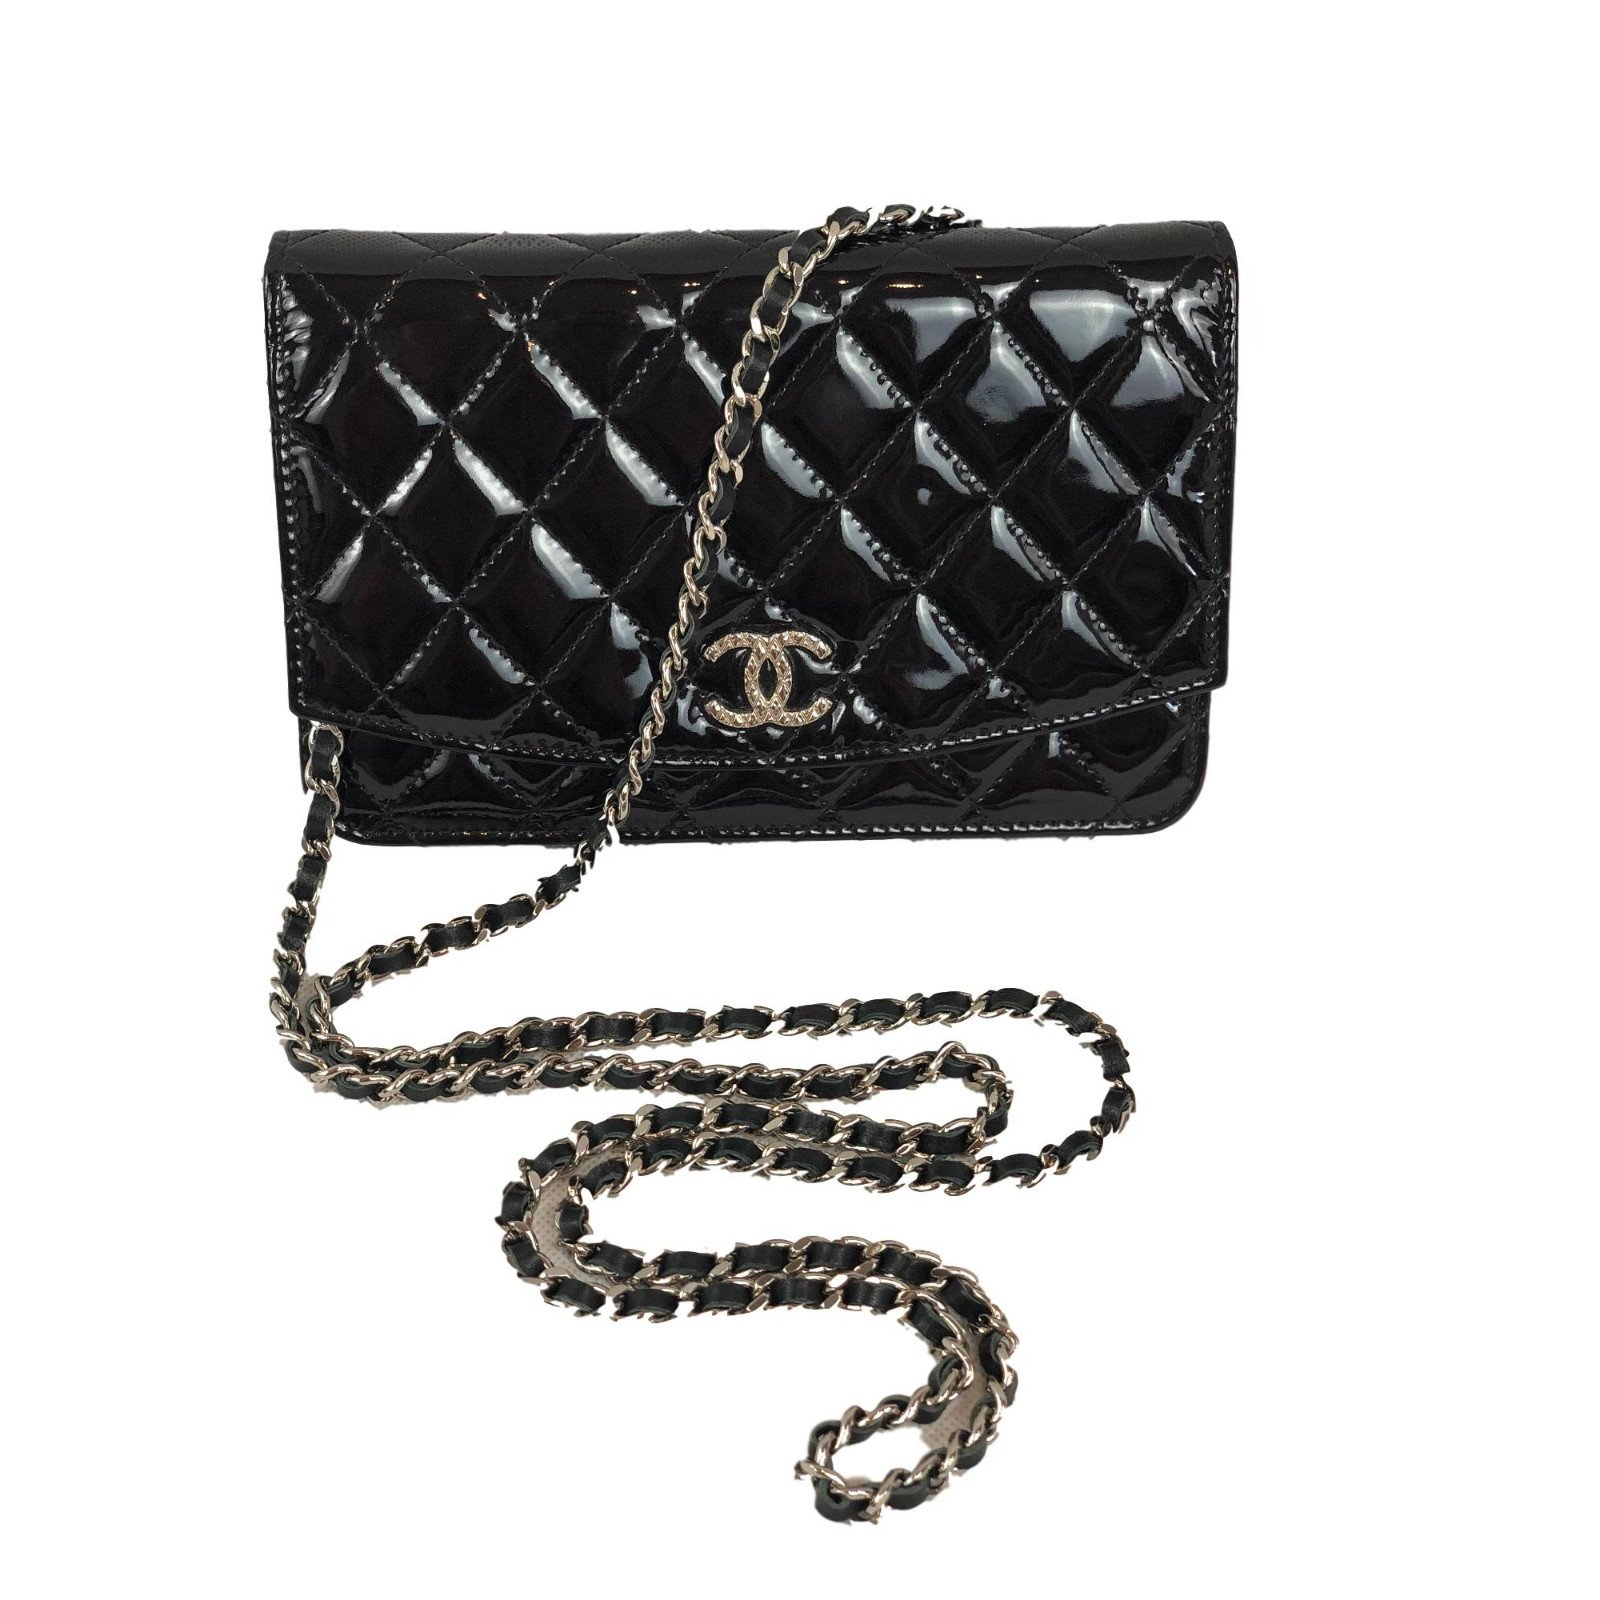 1703be12e9a5 Chanel WOC Handbags Patent leather Black ref.75417 - Joli Closet